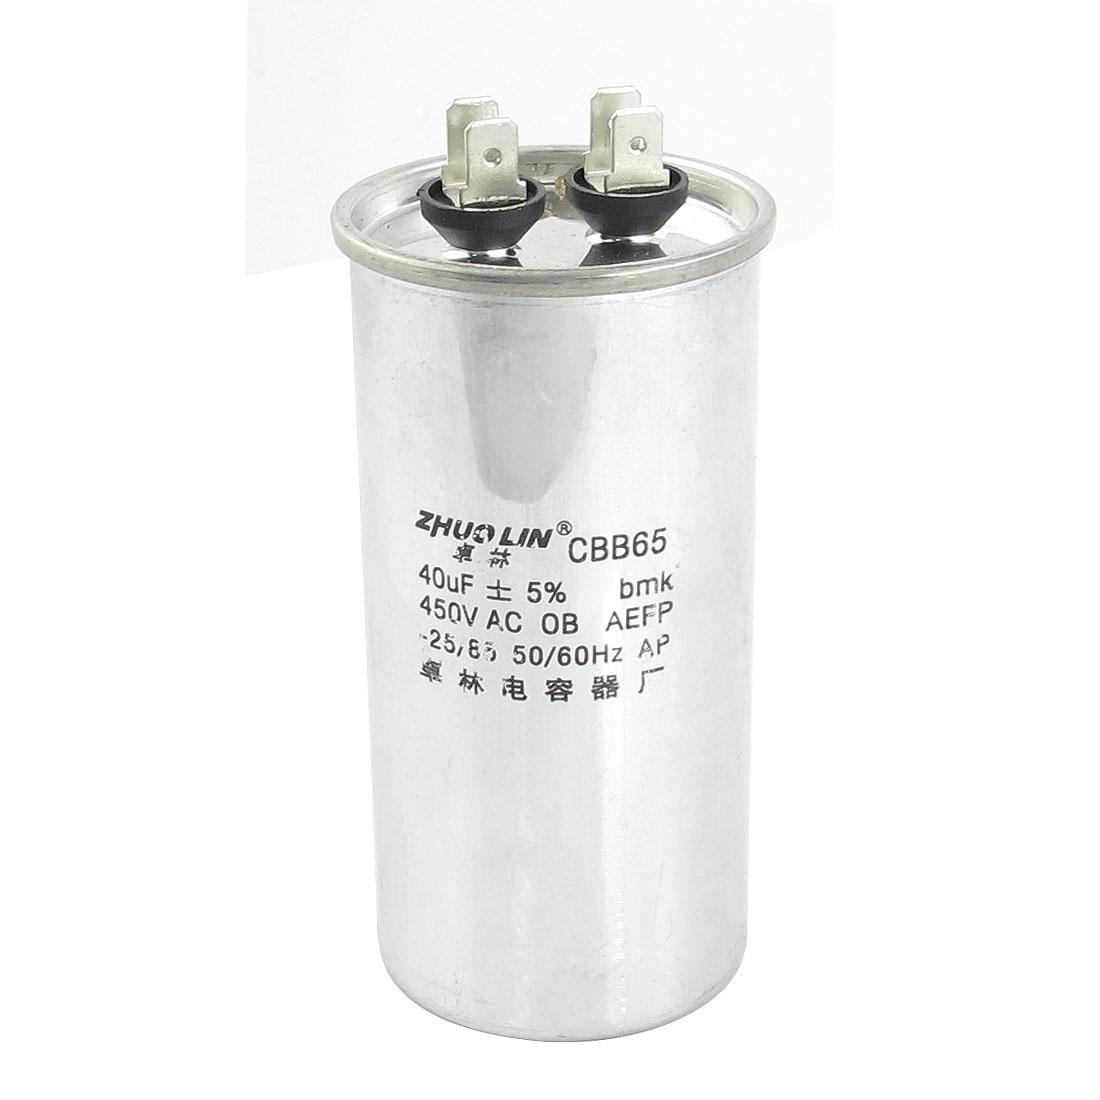 CBB65 AC450V 40uF Capacitance 5% Polypropylene Film Motor Running Capacitor for Air Conditioner